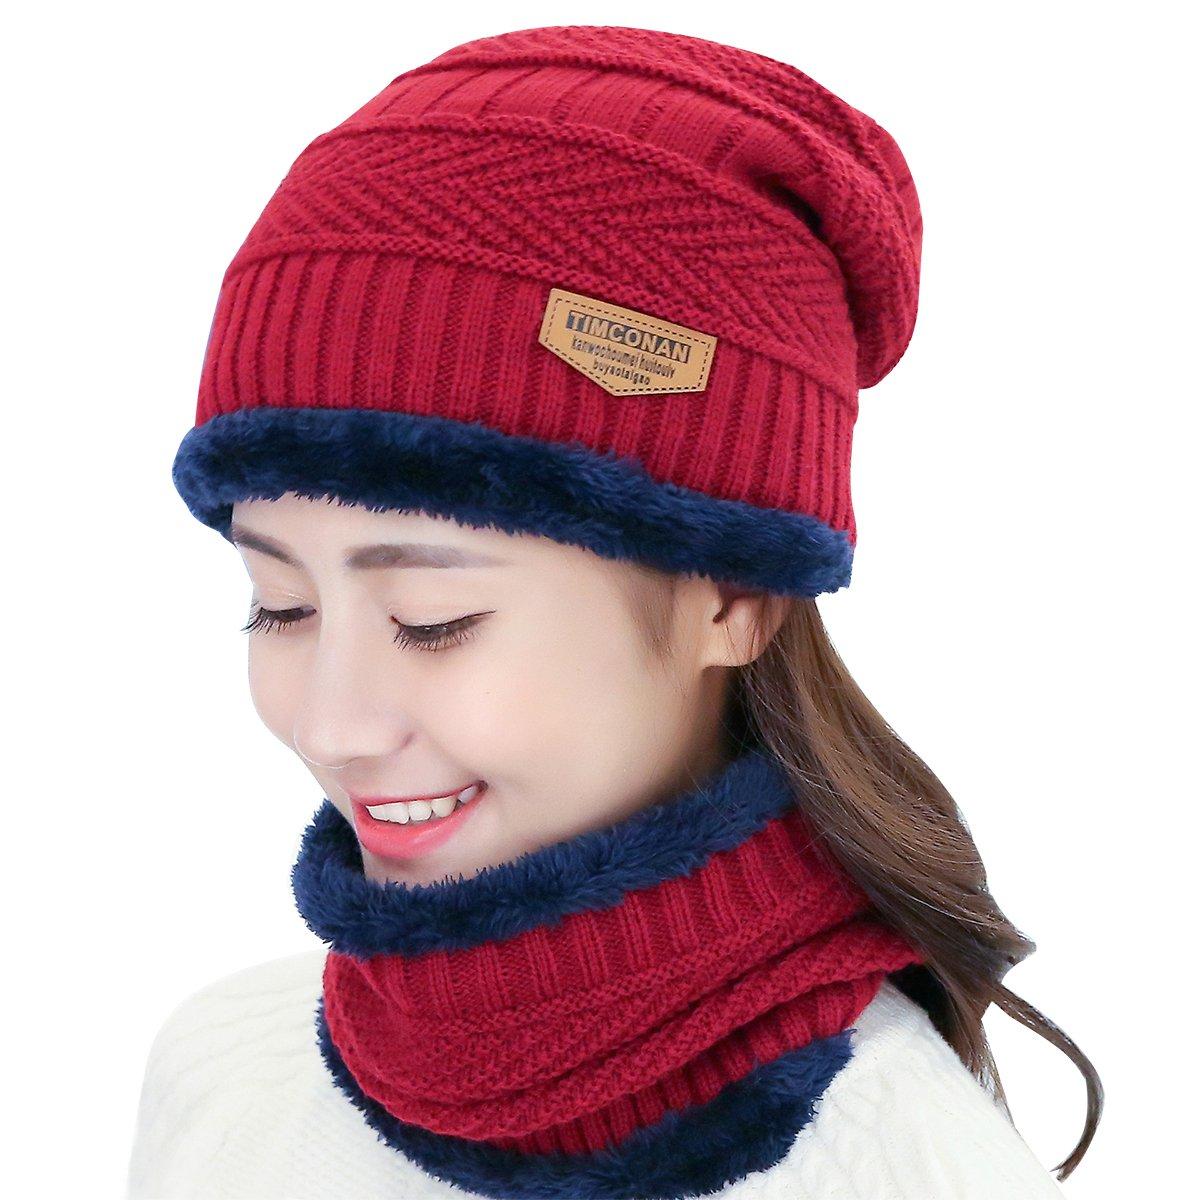 Beanie Scarf Man Unisex Adult Wool Beanie Hat Autumn-Winter Crochet Warm Hat with Knitted Wool Scarf Ski Heating 7JCF135121SEG9O64